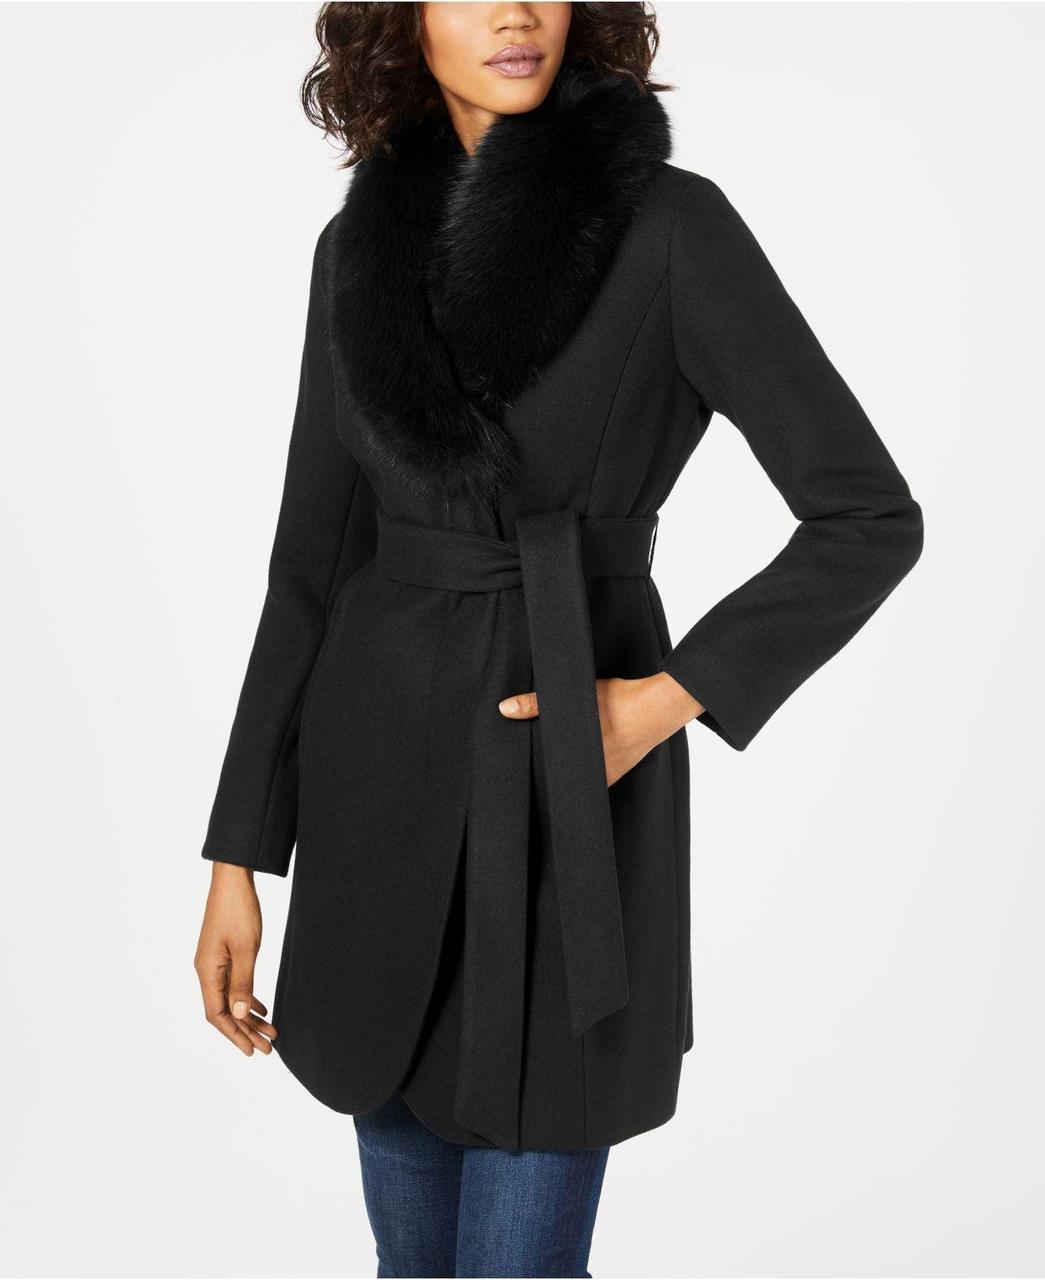 Forecaster Женское пальто - Е2